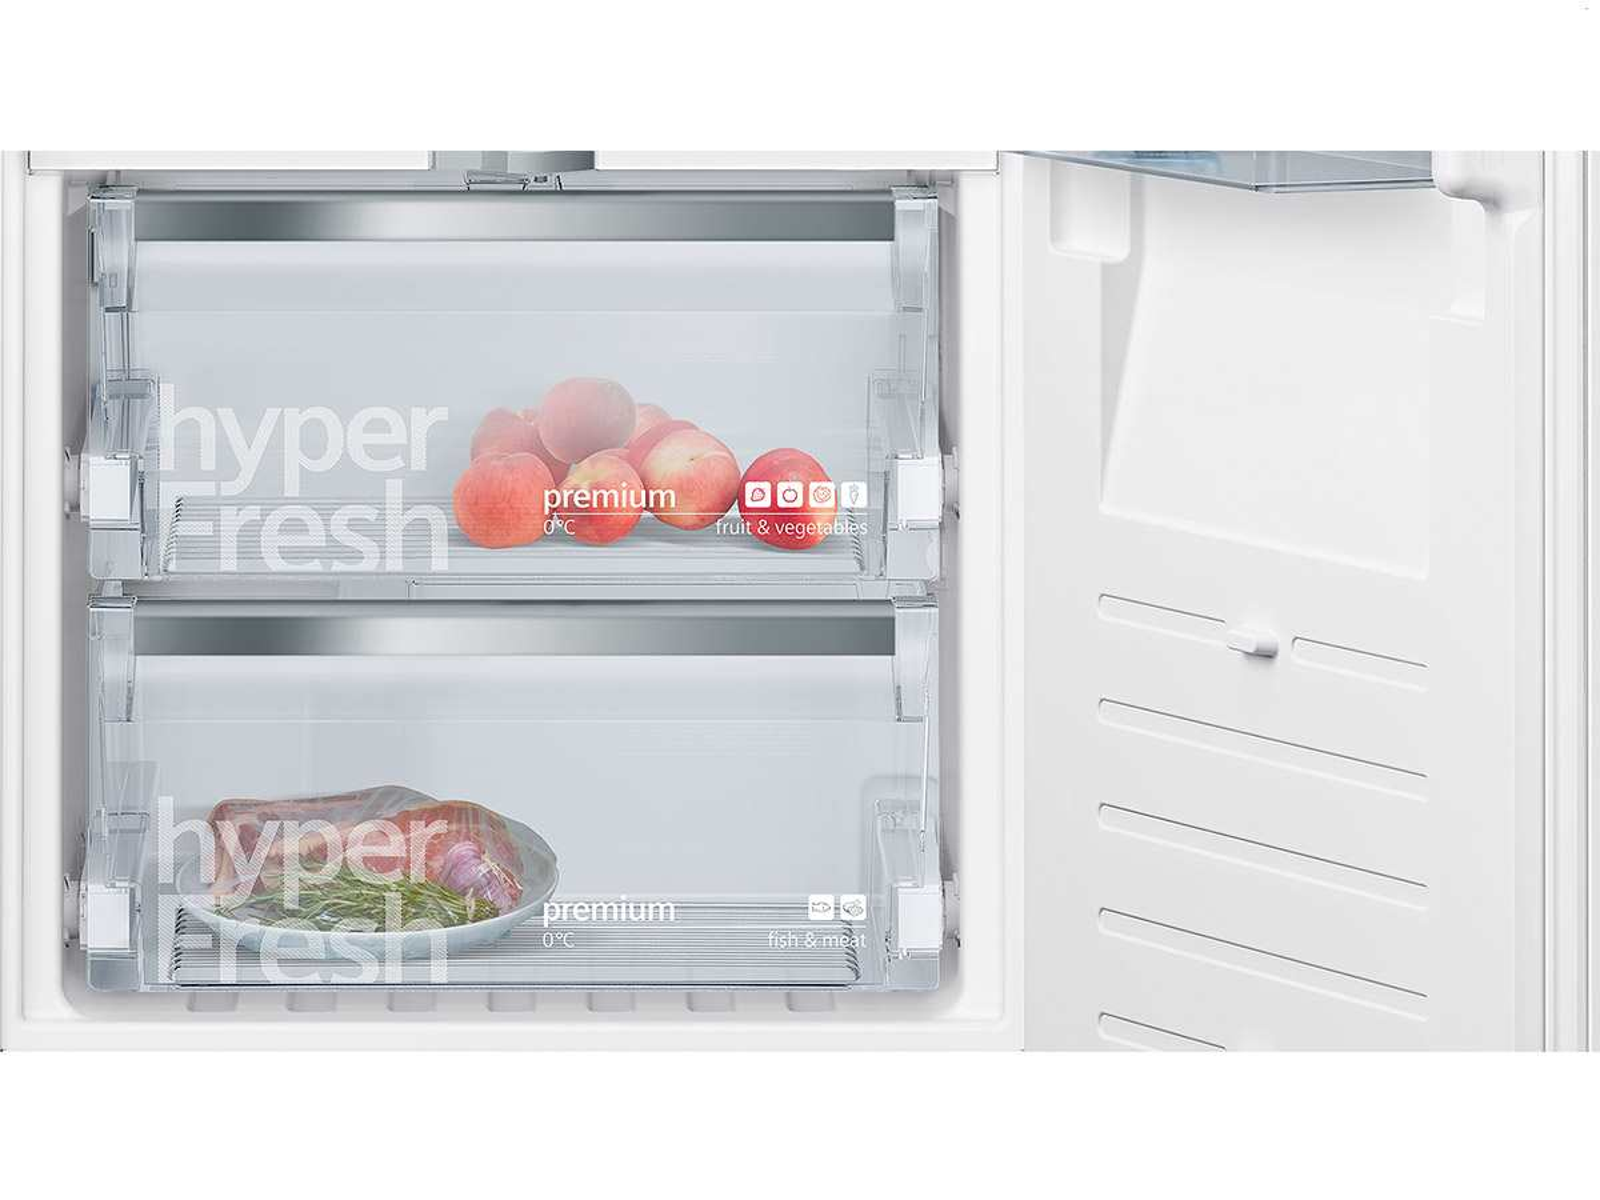 Siemens Kühlschrank Hotline : Siemens studioline ki fsd einbaukühlschrank